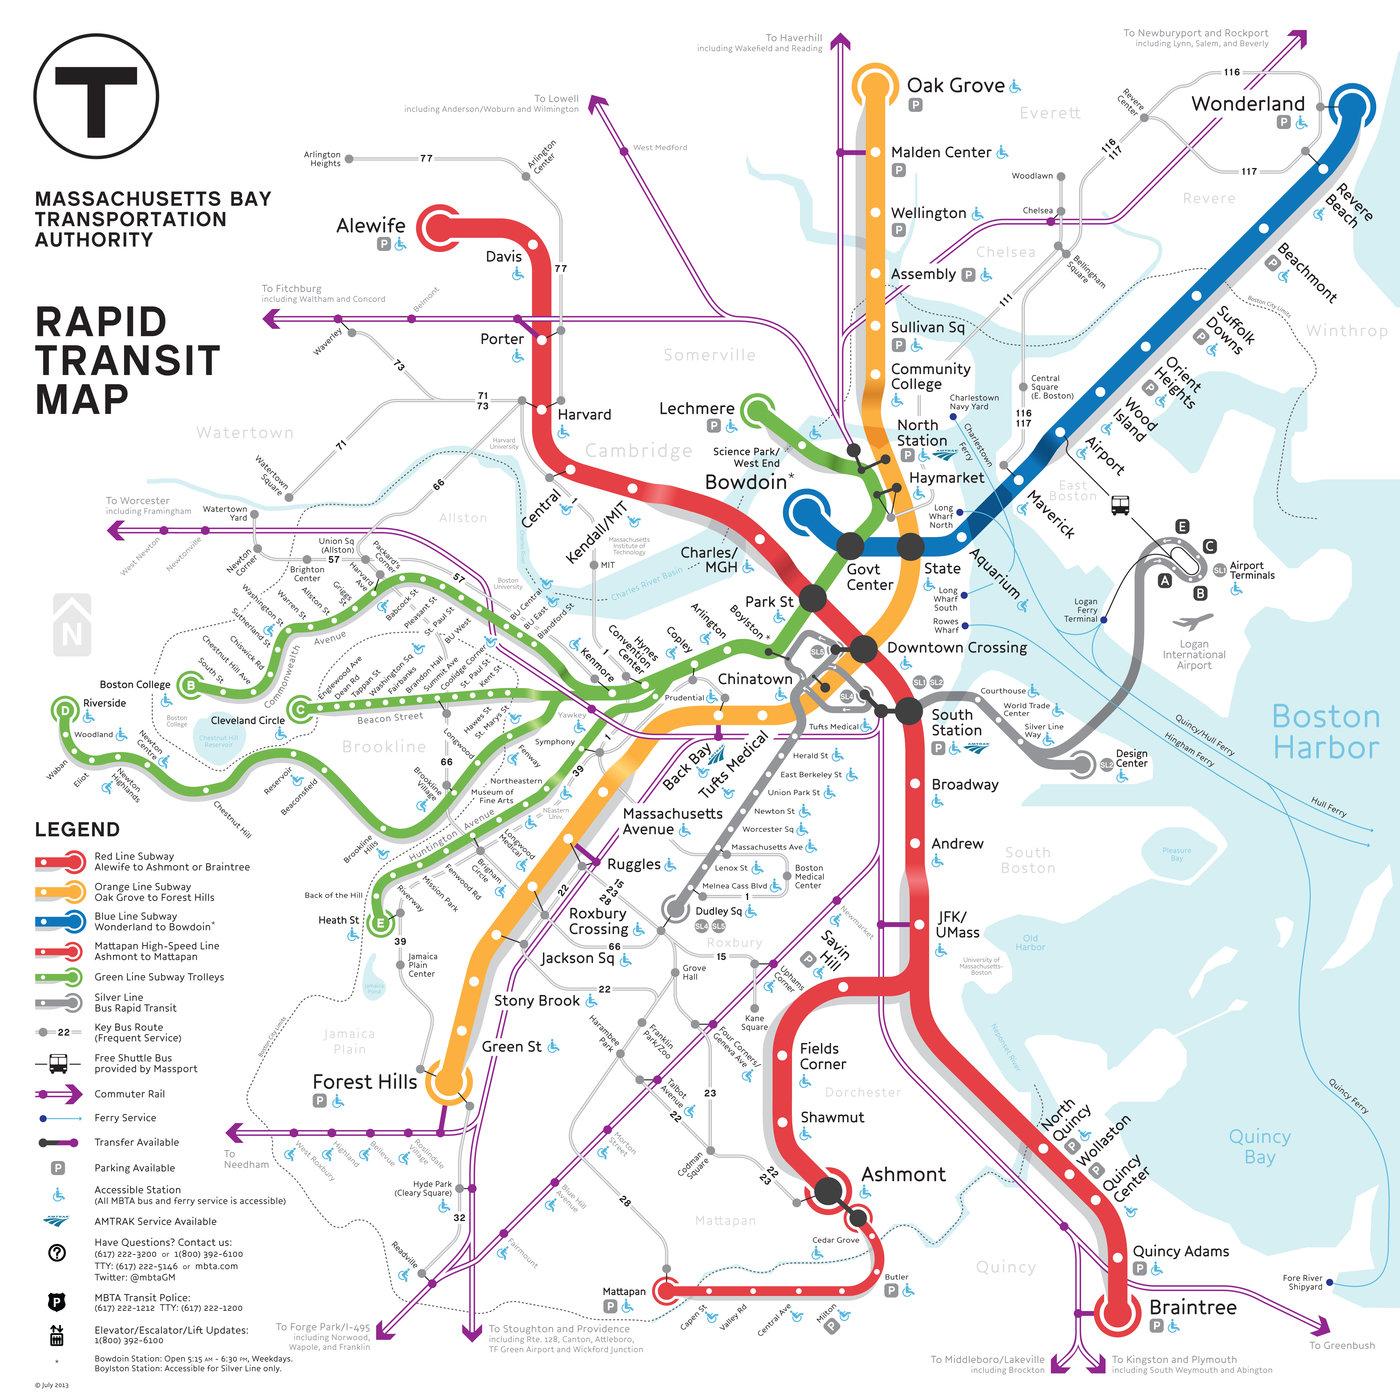 Mbta Subway Map Boston Ma.Boston Metro Map Competition Entry By Kenneth Miraski At Coroflot Com